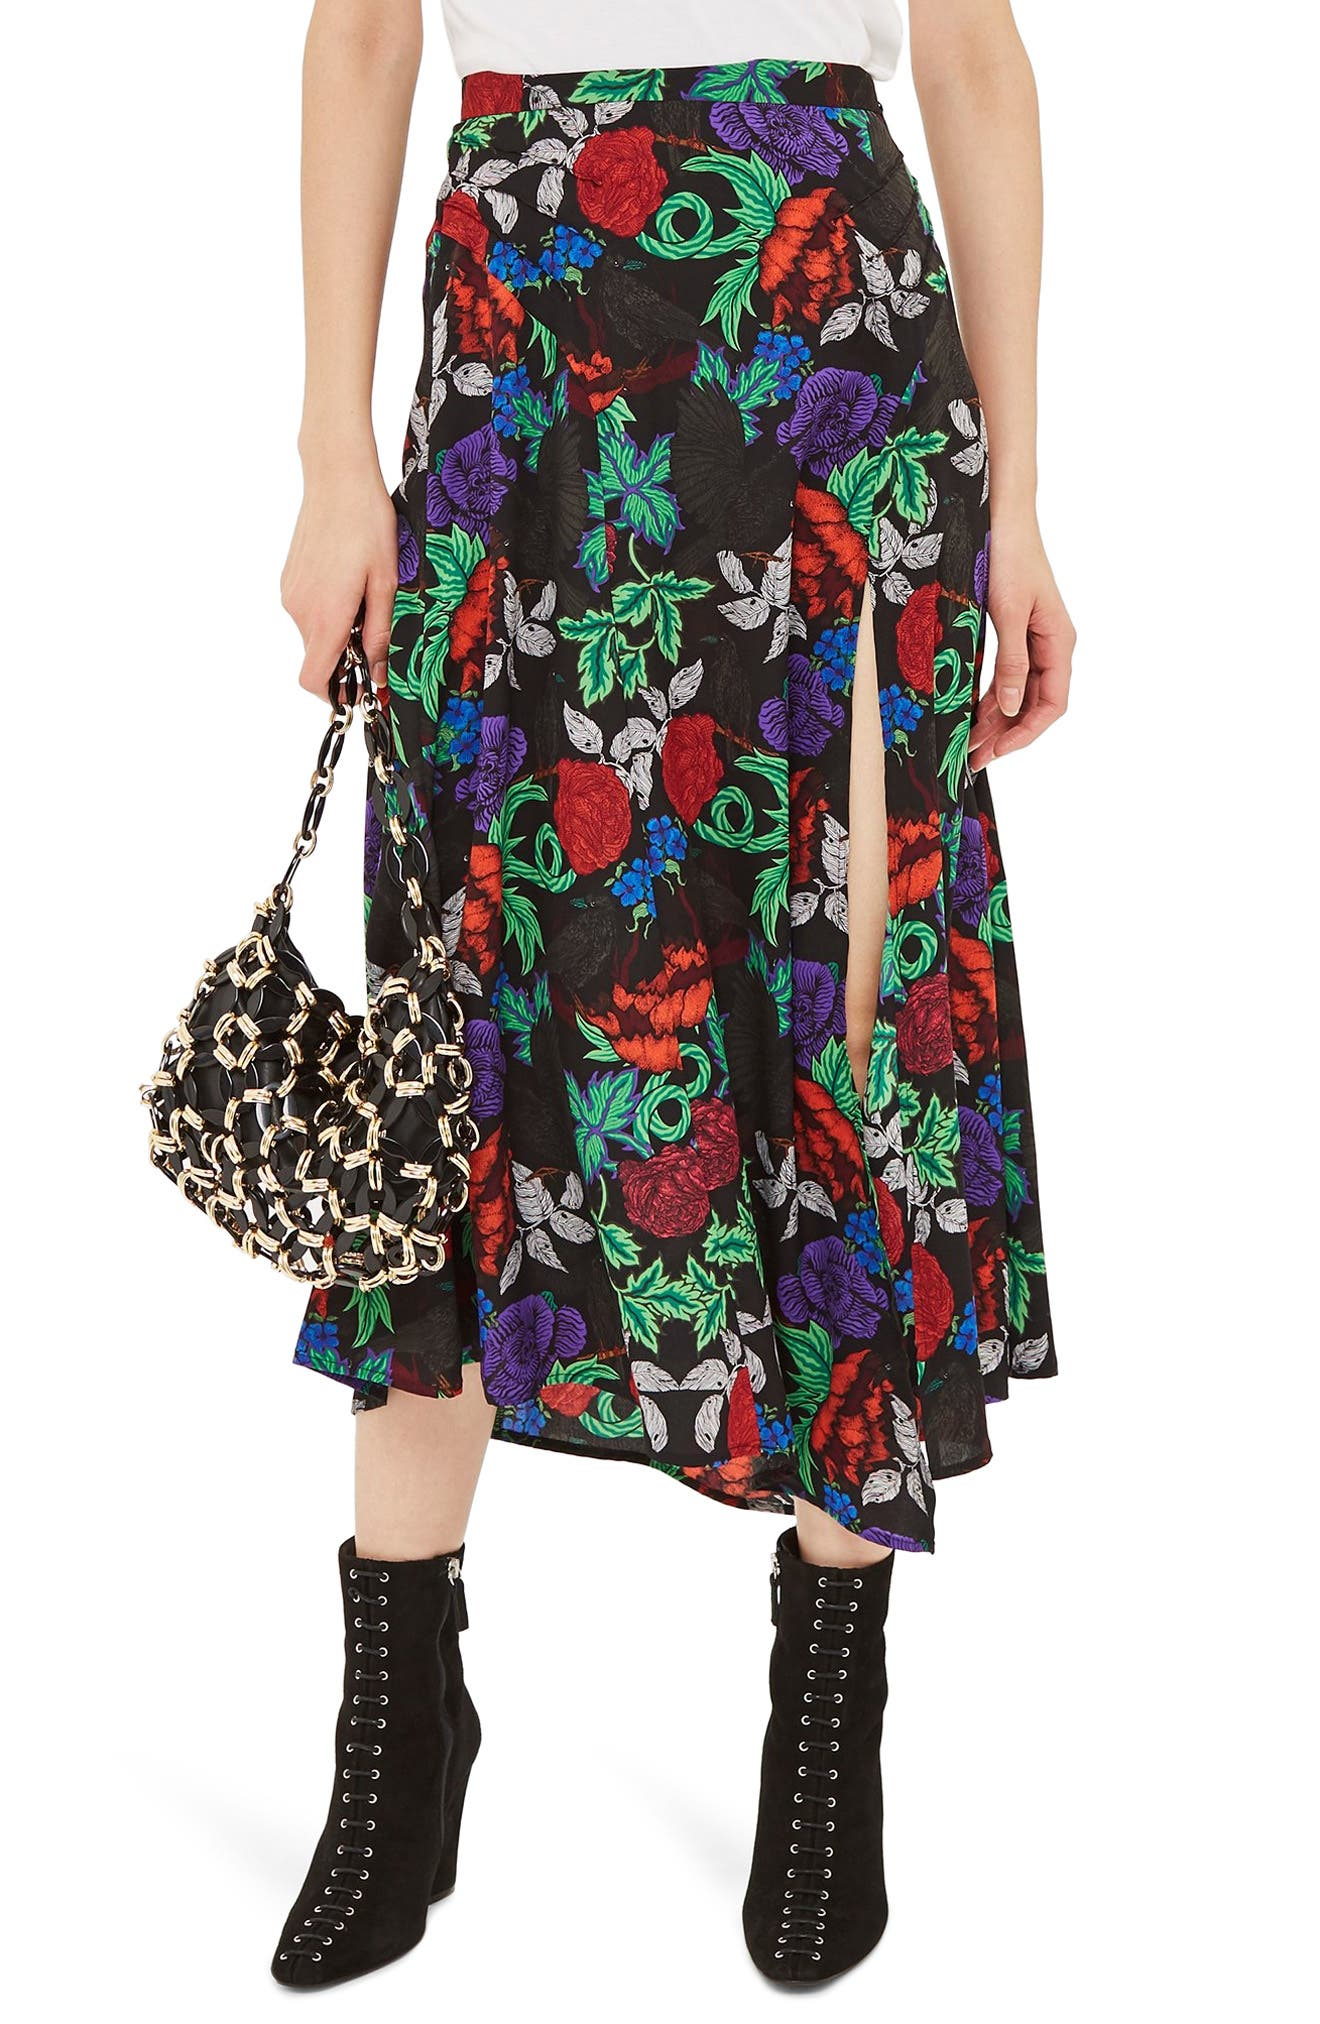 Topshop Raven Floral Midi Skirt, US (fits like 0) - Black